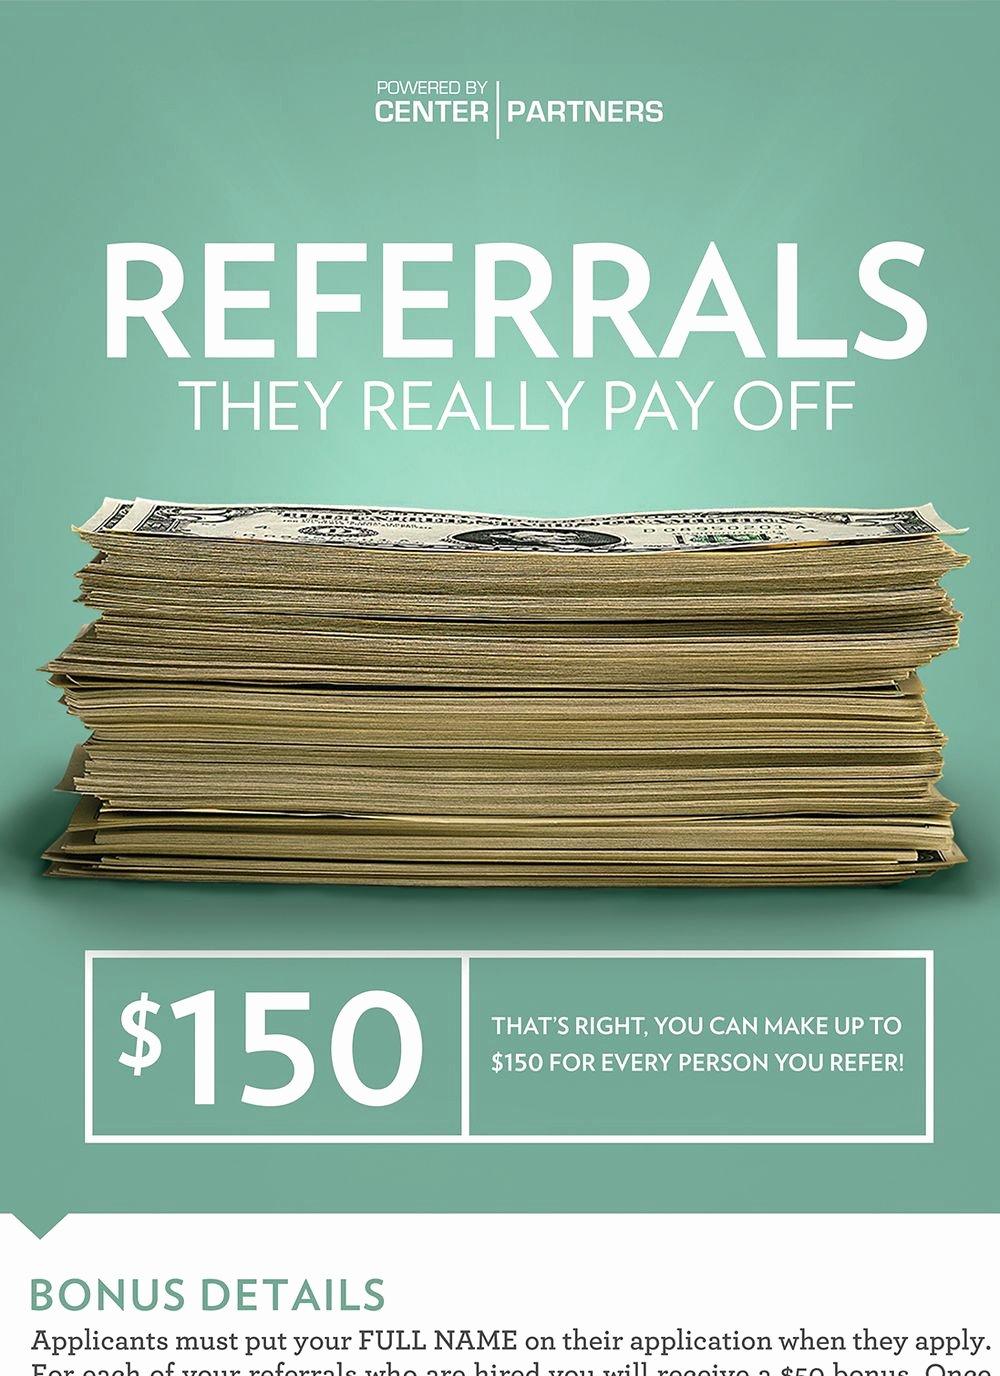 Employee Referral Program Template Elegant Center Partners — Employee Referral Program Poster Close